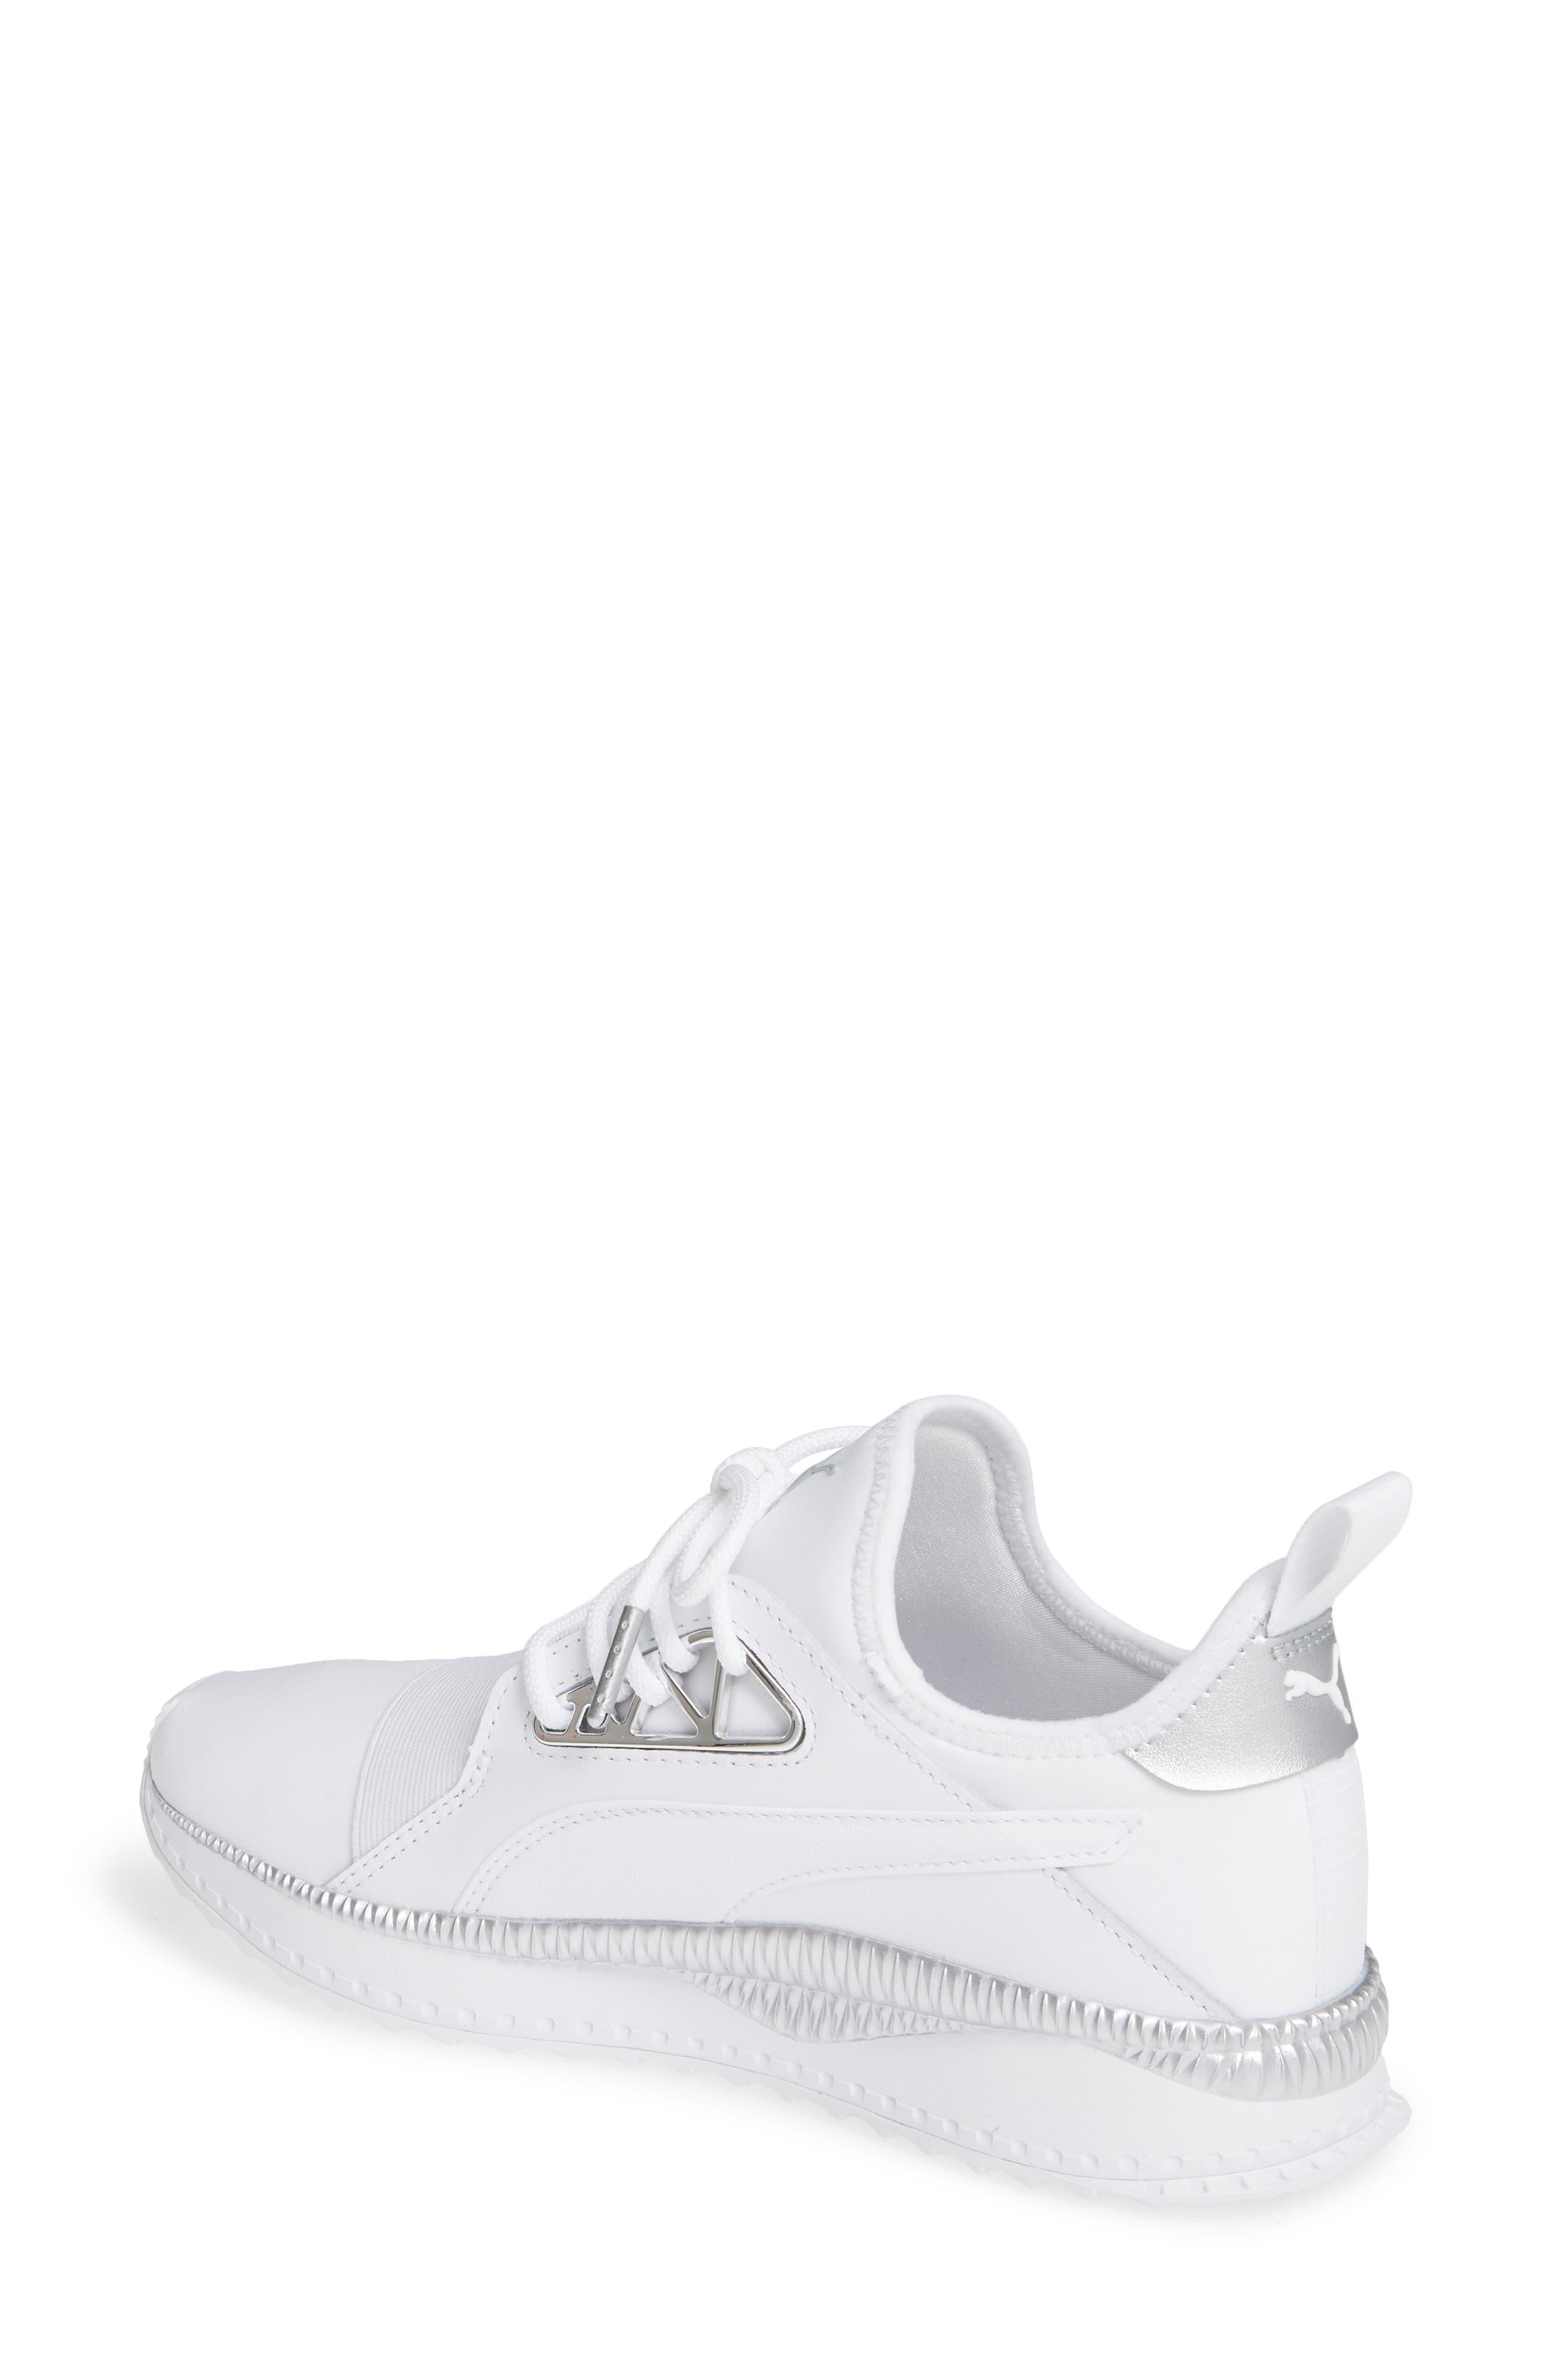 TSUGI Apex Jewel Sneaker,                             Alternate thumbnail 2, color,                             PUMA WHITE/ PUMA WHITE